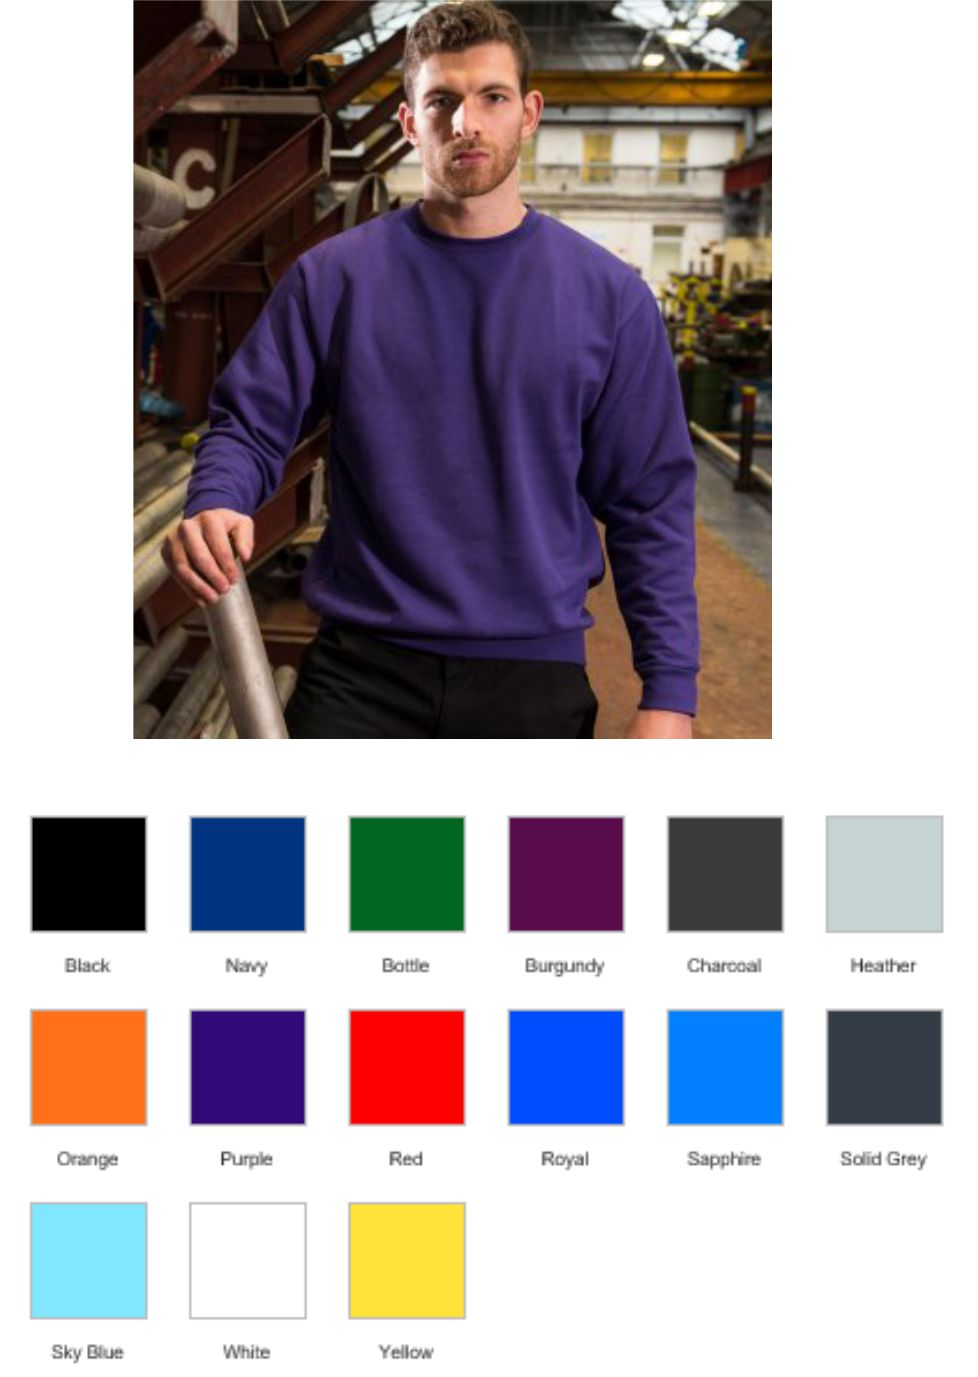 215d2c1fa RX301 Pro RTX Pro Sweatshirt - £8.25   Ark Trading